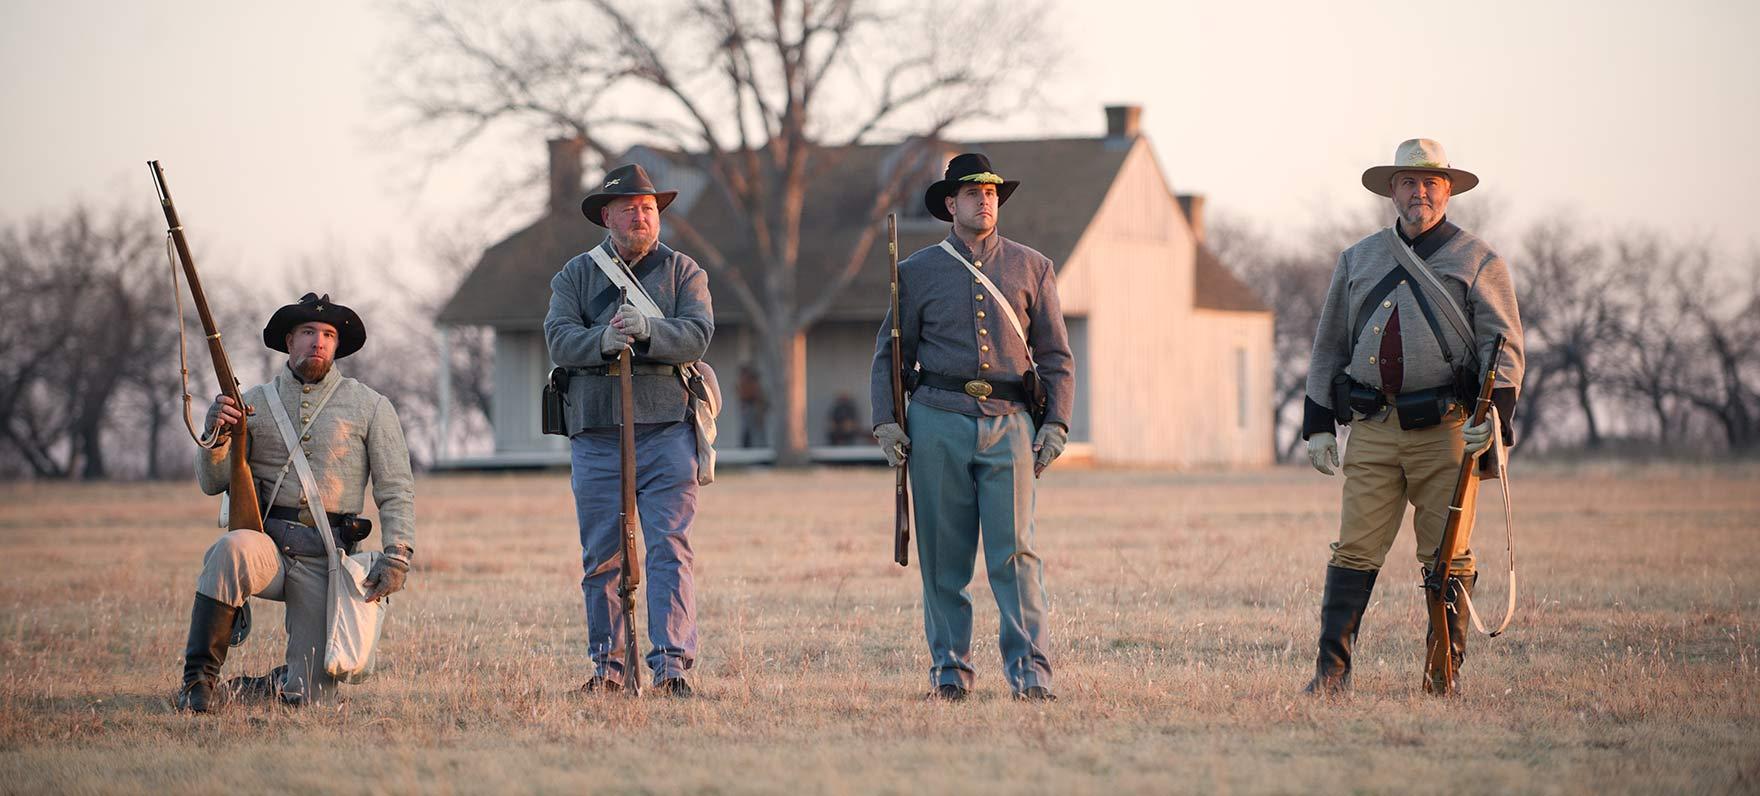 Bringing history to life at Fort Richardson.